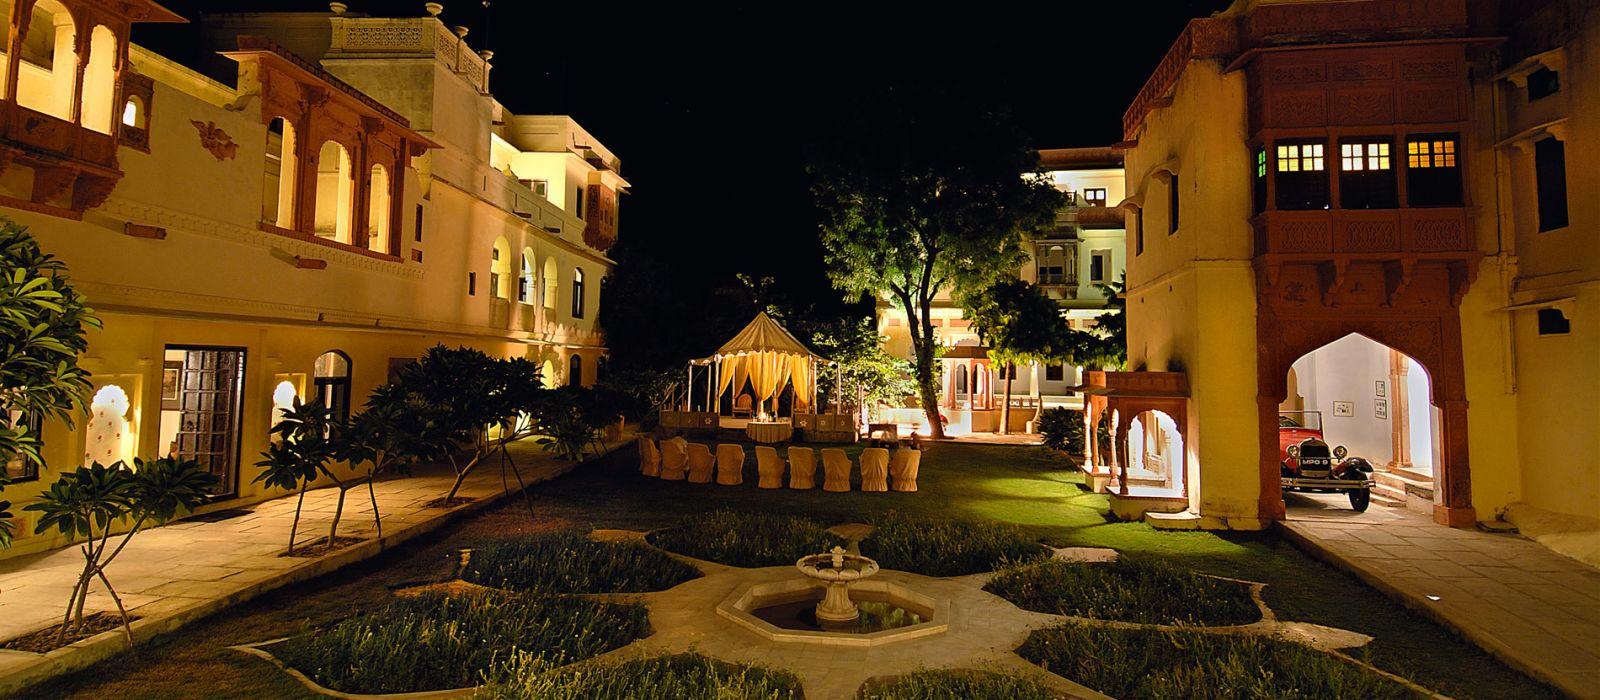 Hotel Rawla Jojawar Nordindien